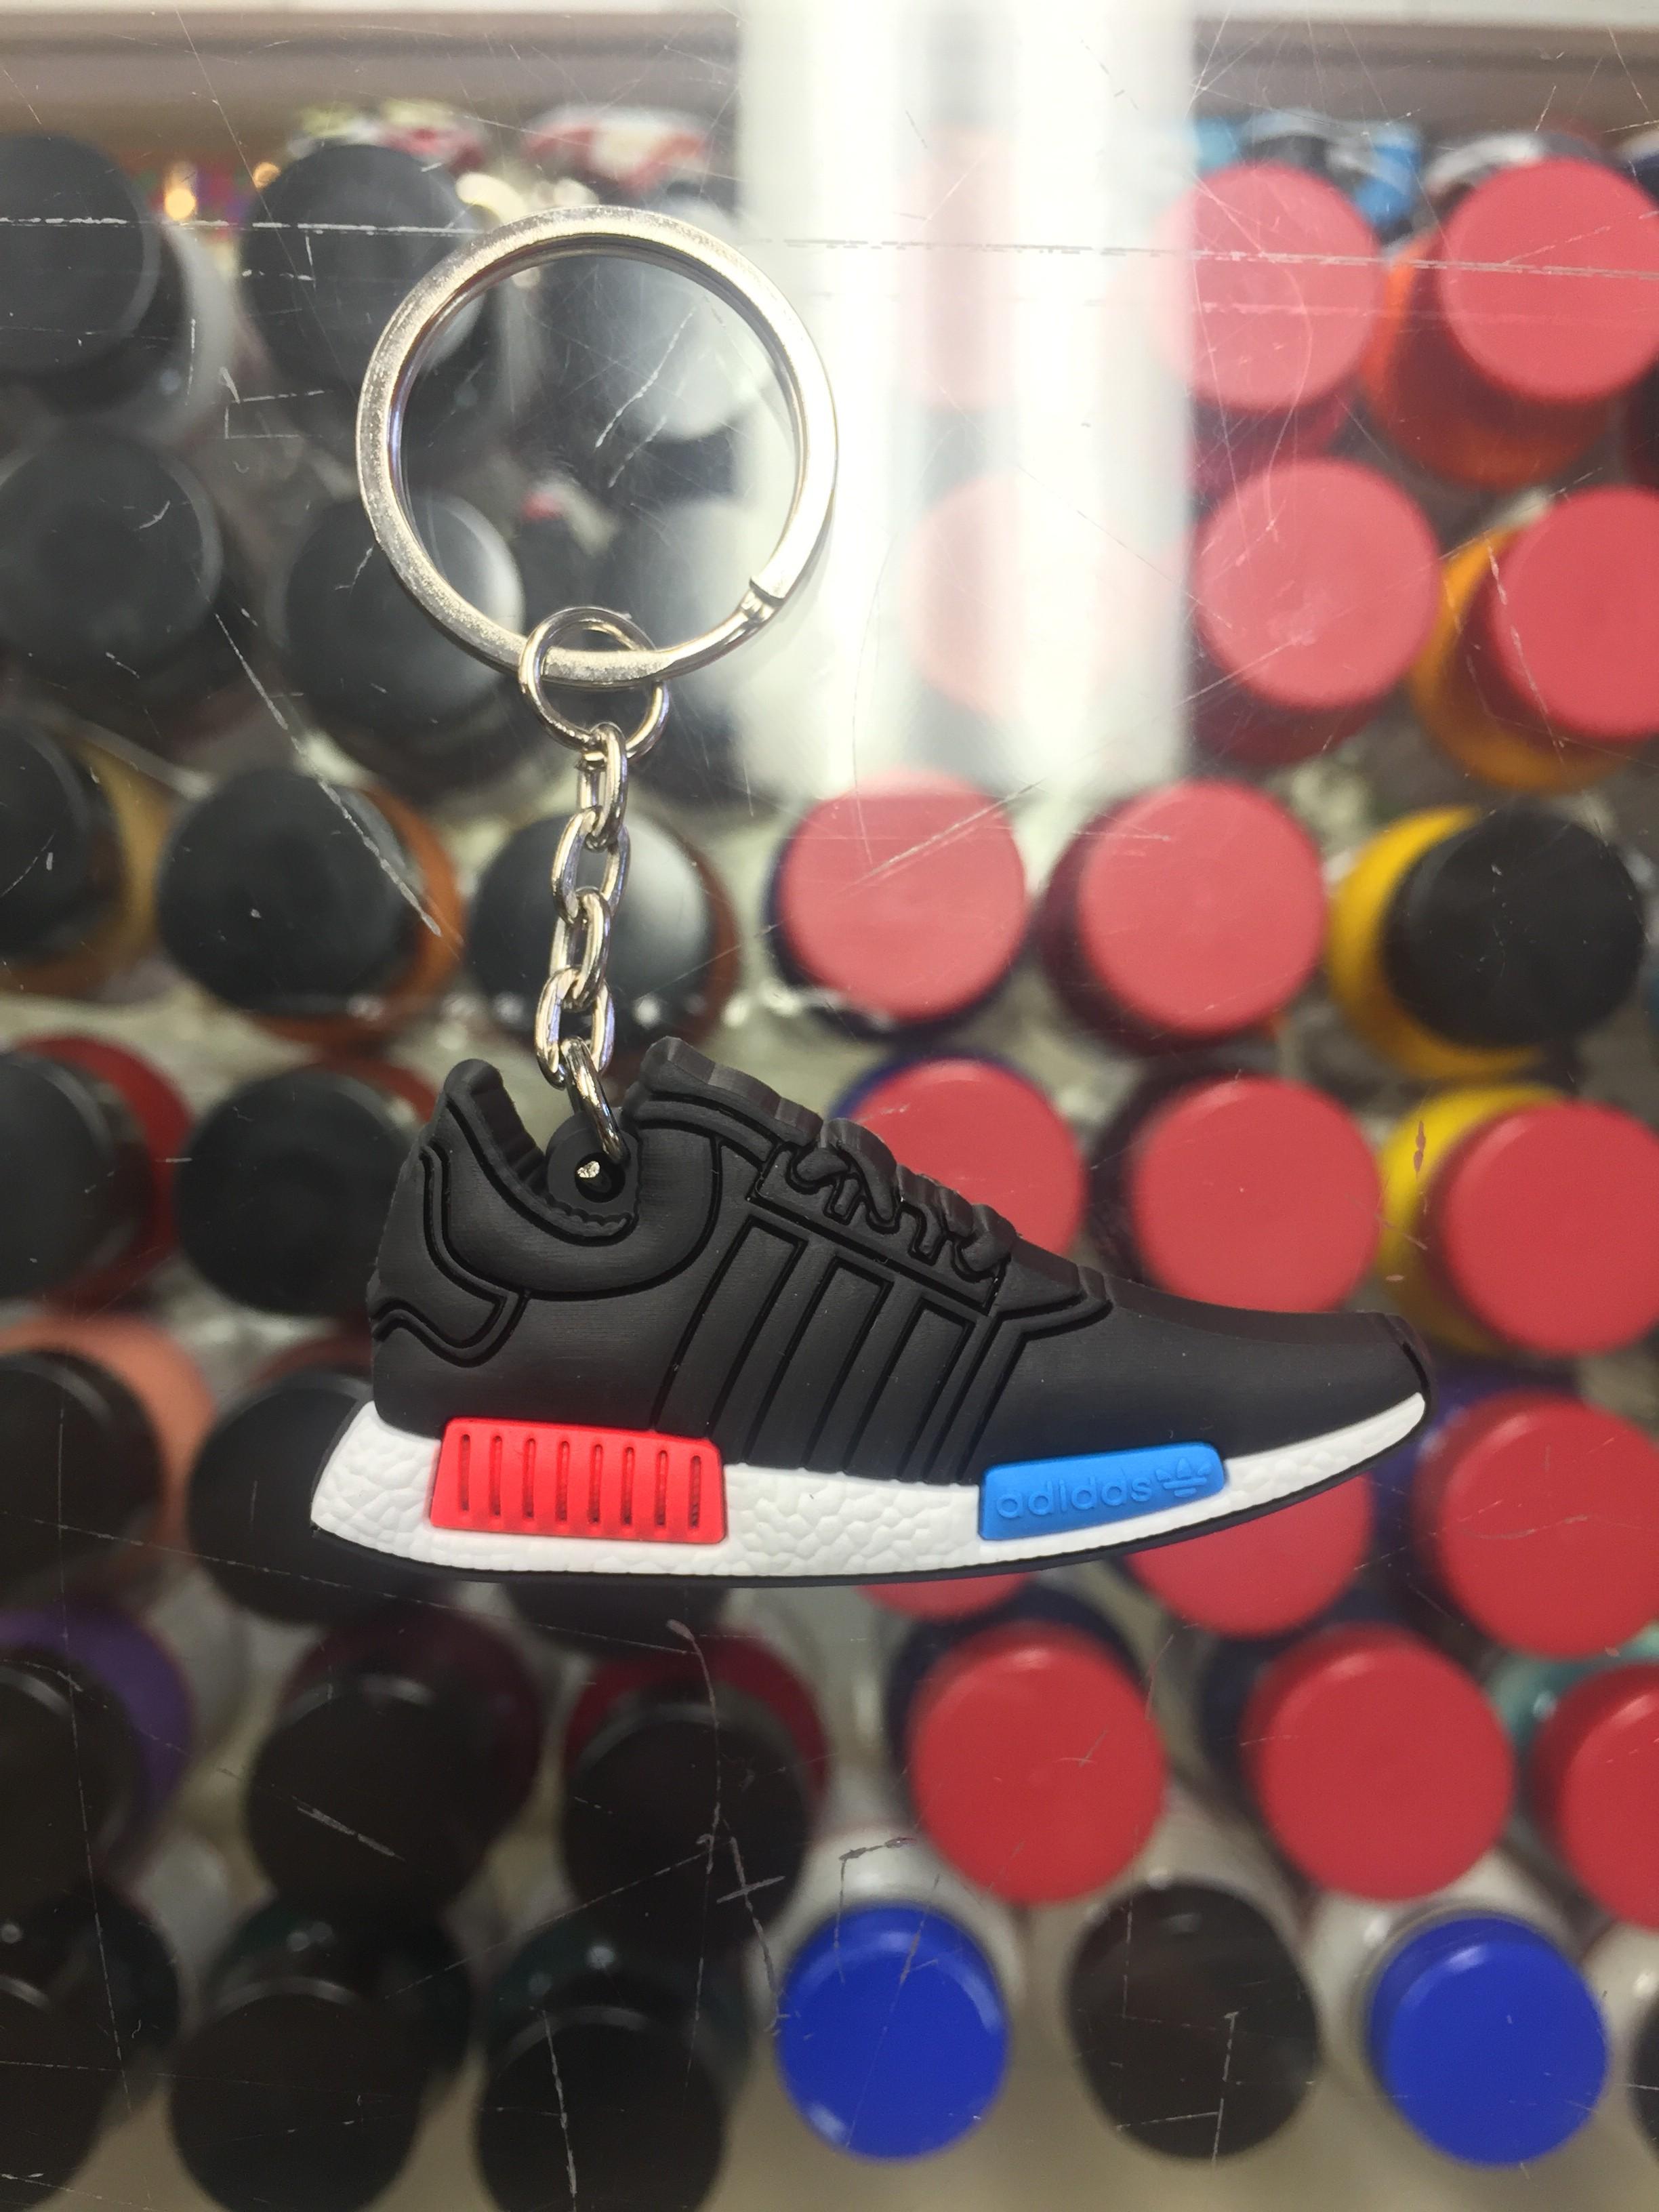 pretty nice 28b26 86d96 2016 Adidas NMD Runner PK Black White Red Blue 2D Keychain